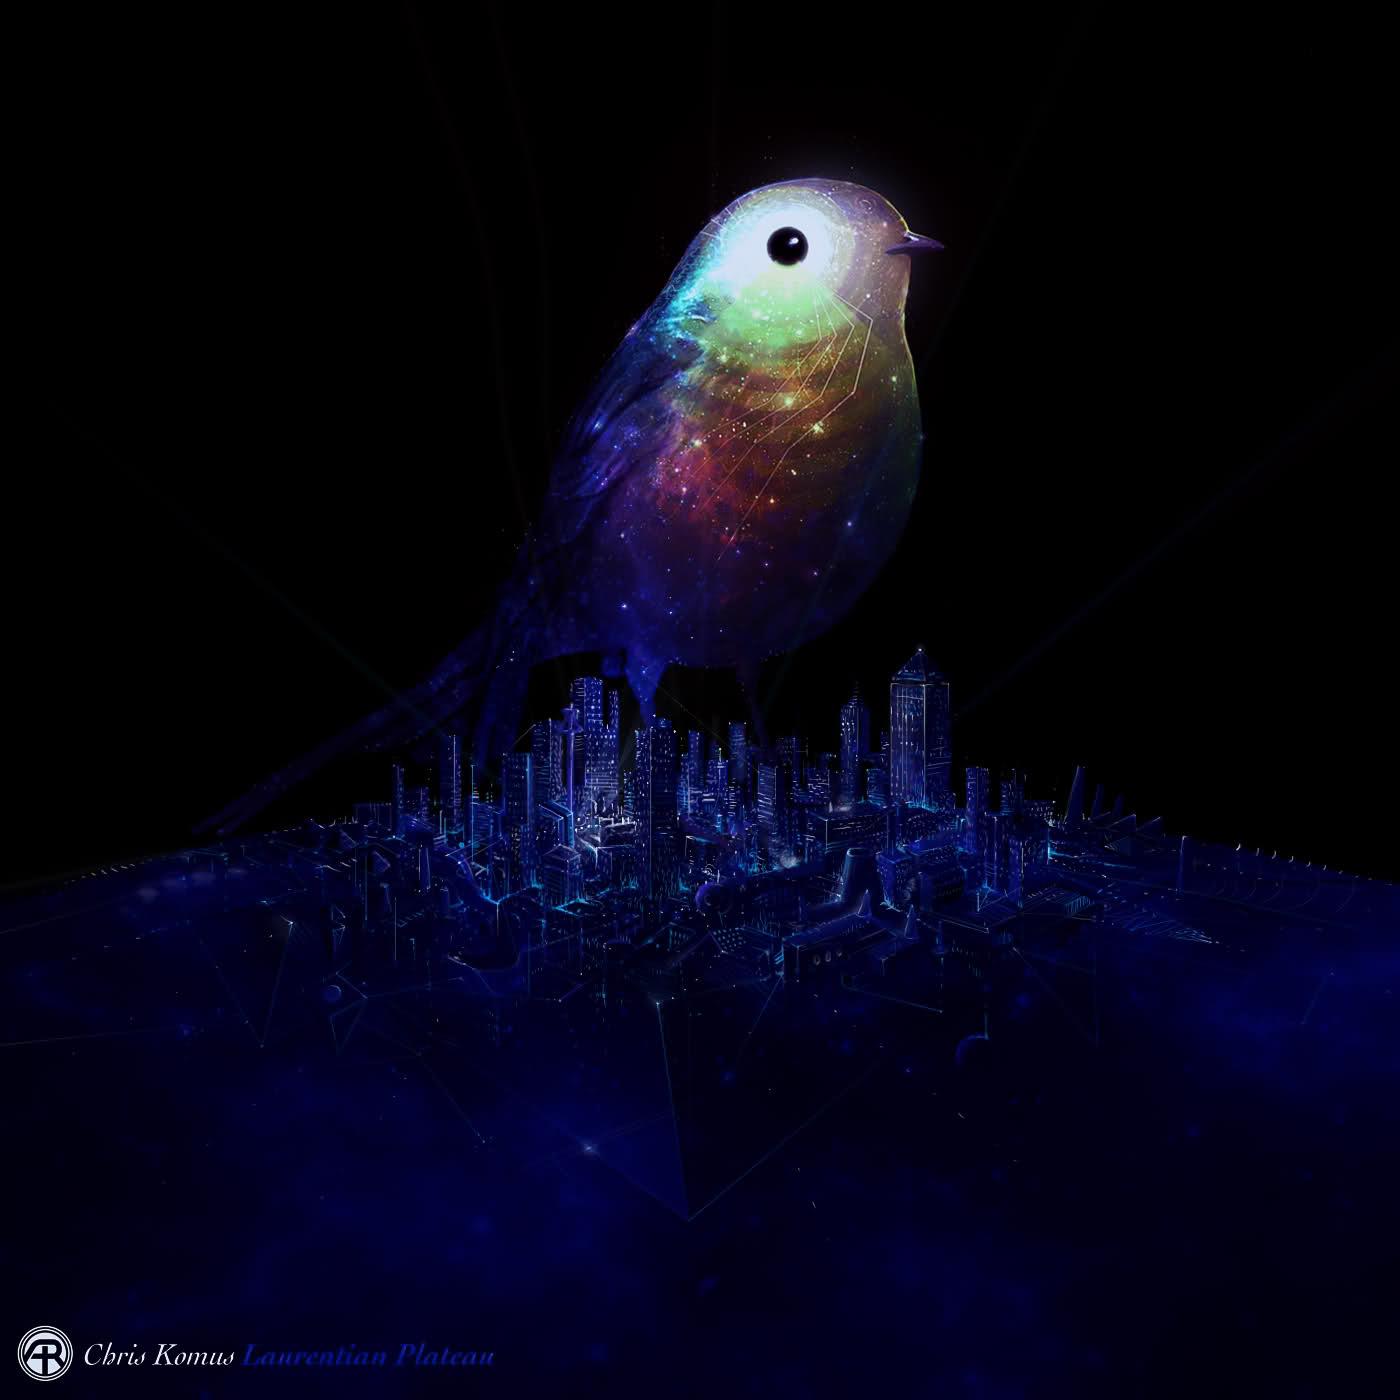 artworks-000029812847-upueh8-original